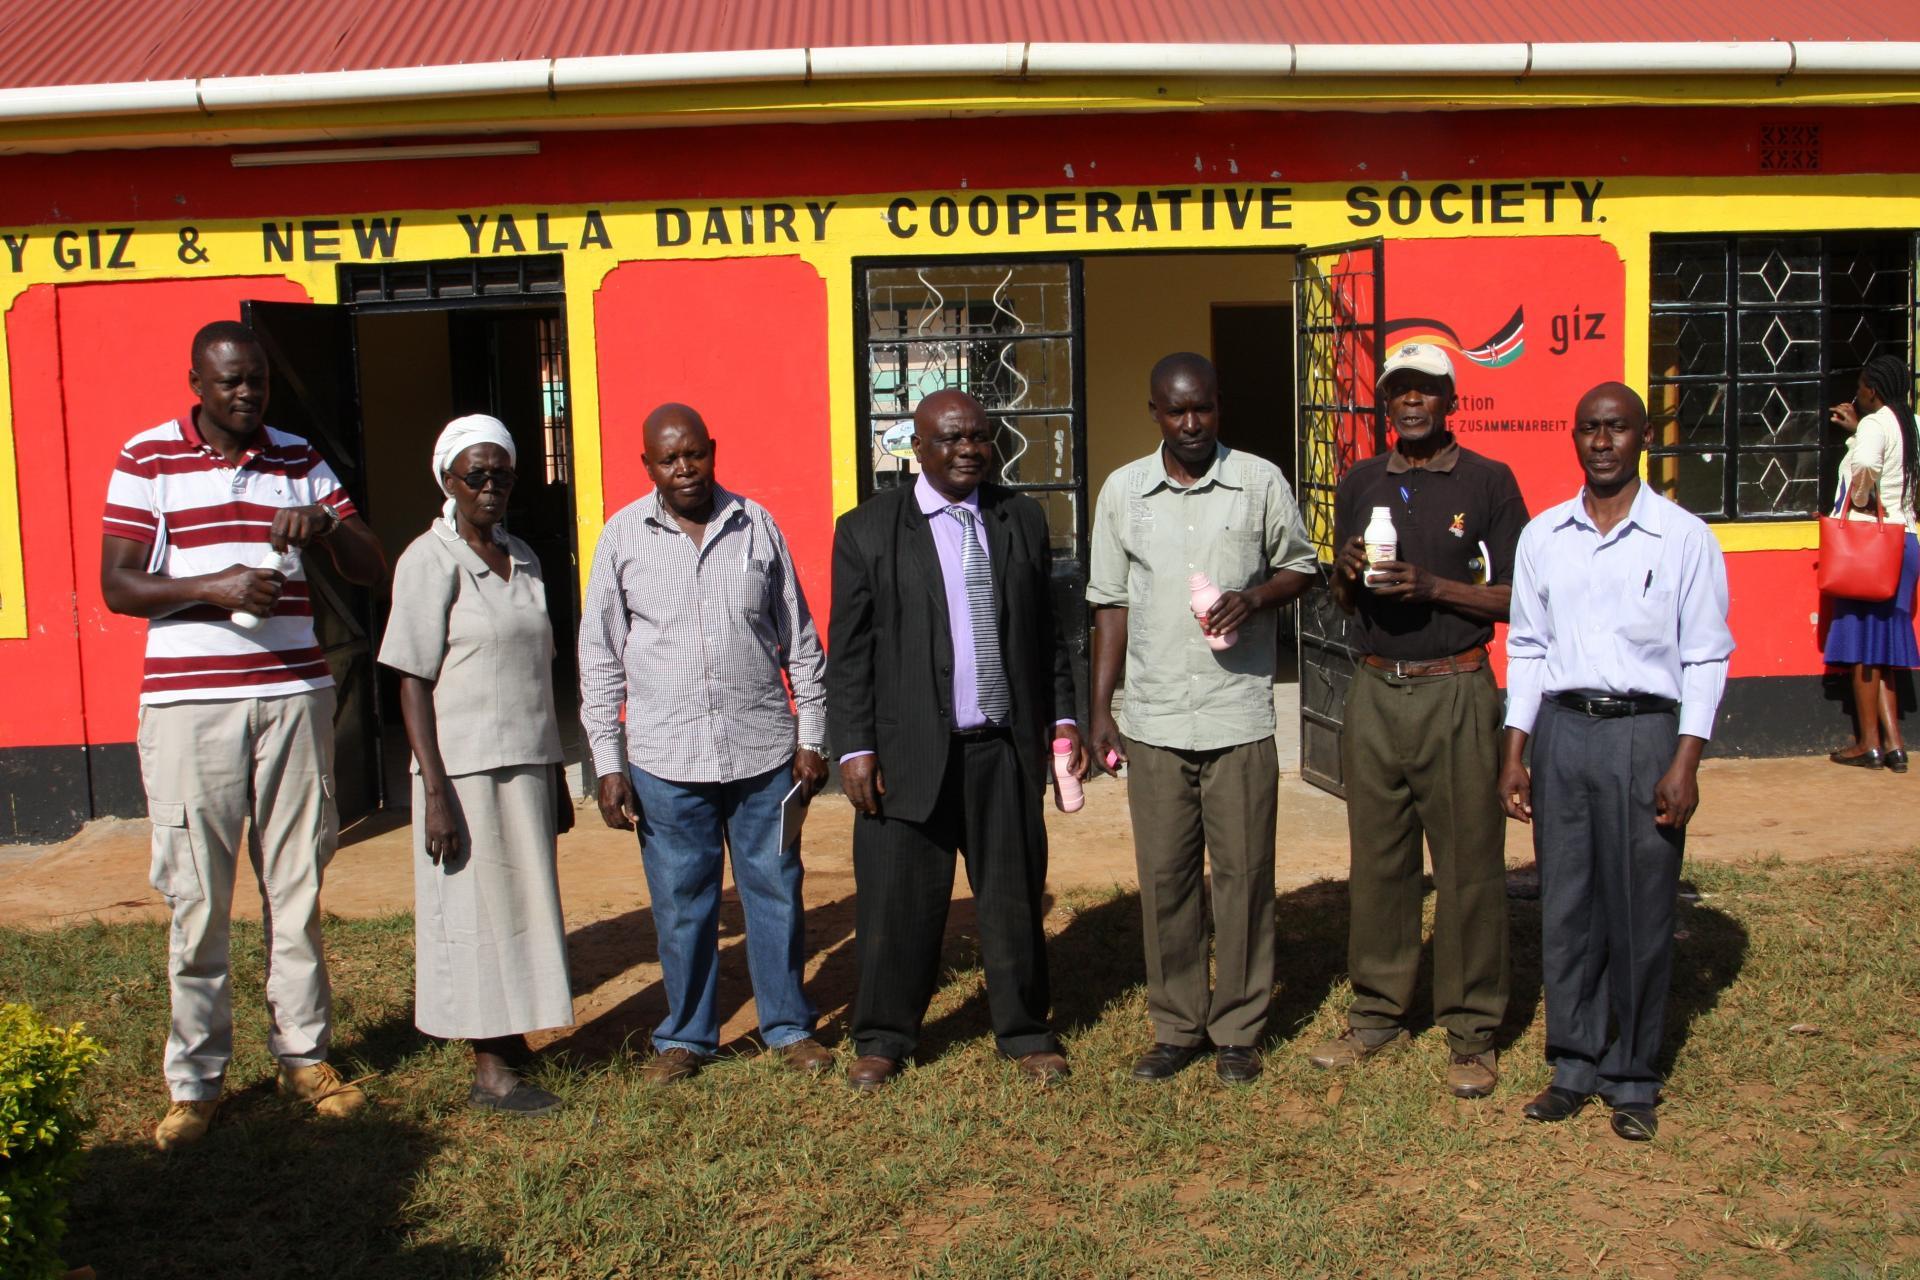 New Yala dairy group